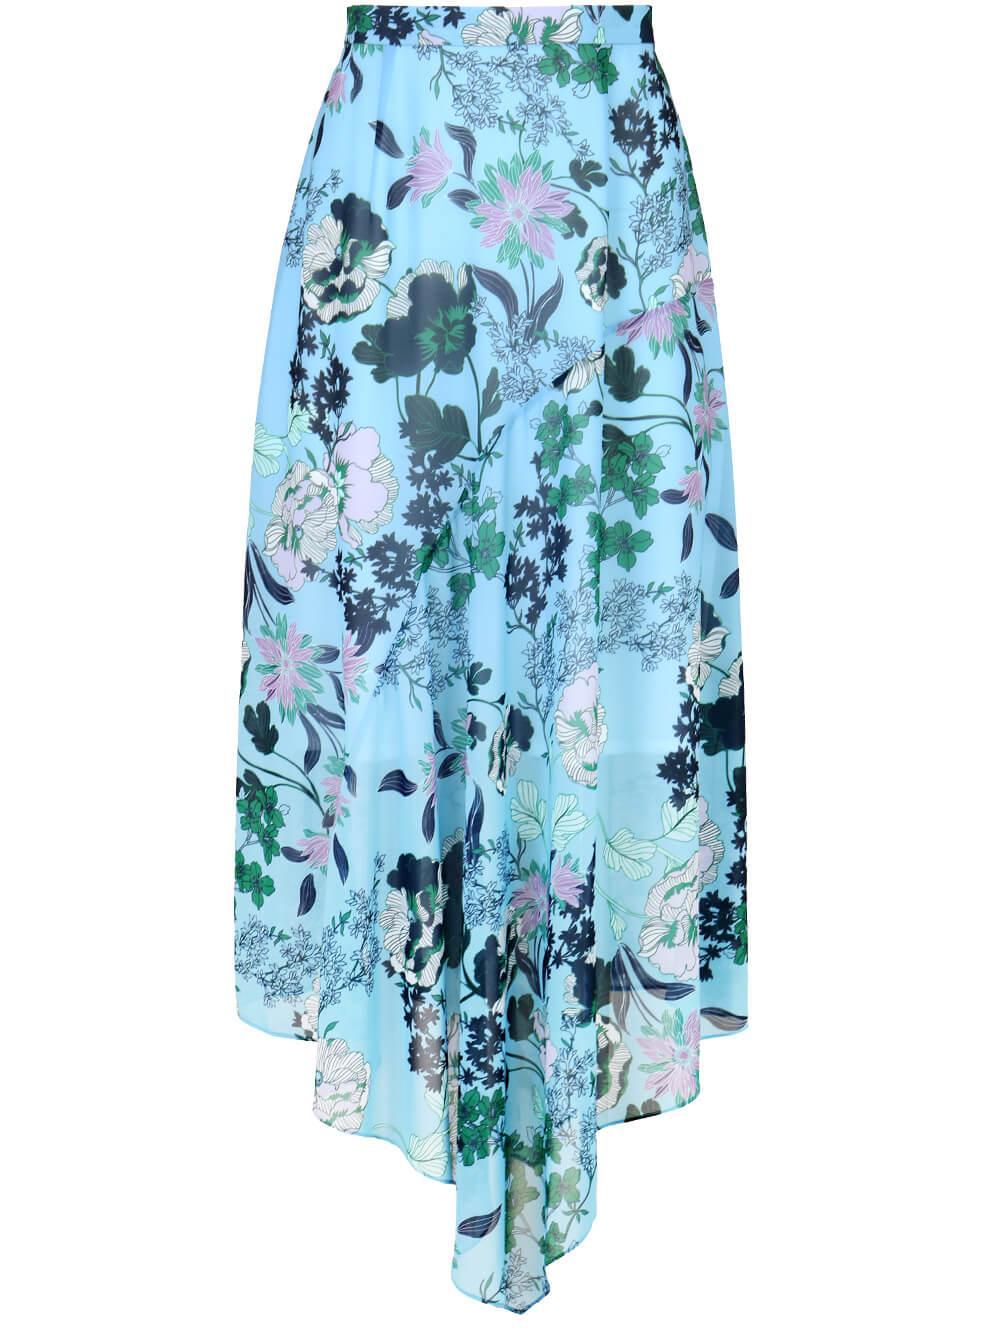 Asymmetrical Printed Skirt Item # SKIRT029B